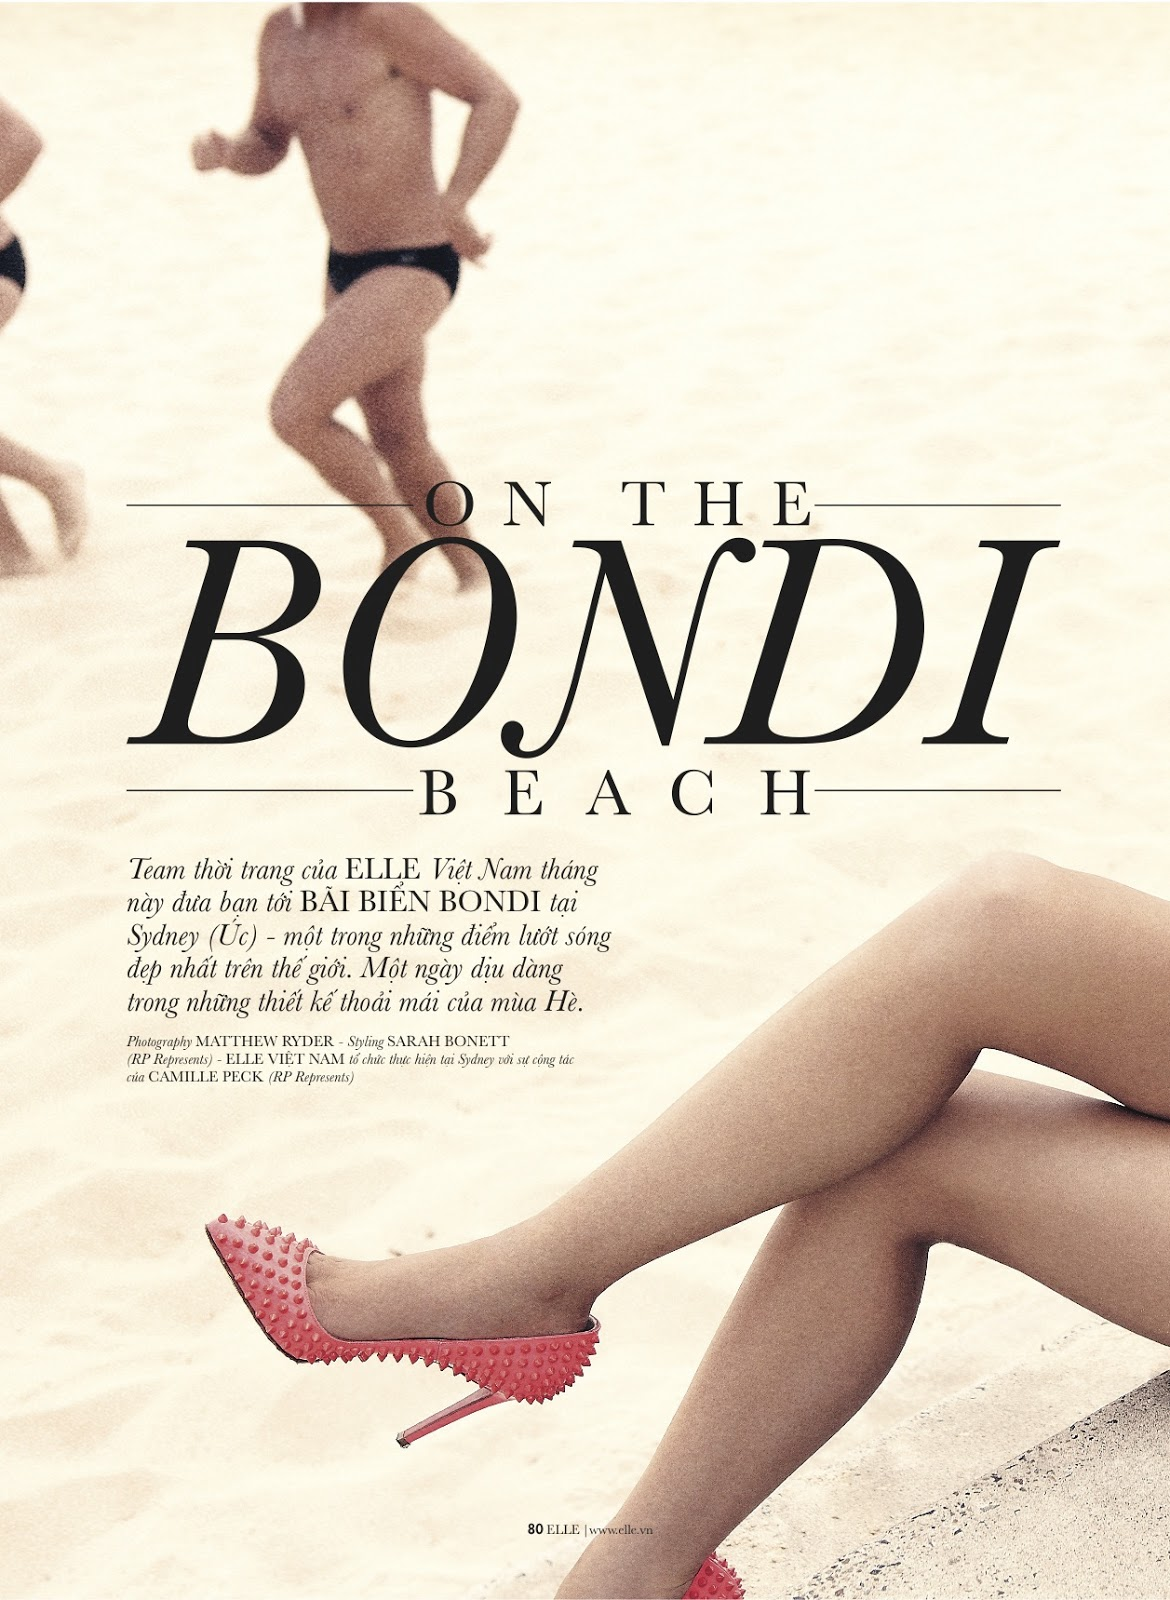 On the Bondi beach Rosie Tupper by Matthew Ryder for Elle 2